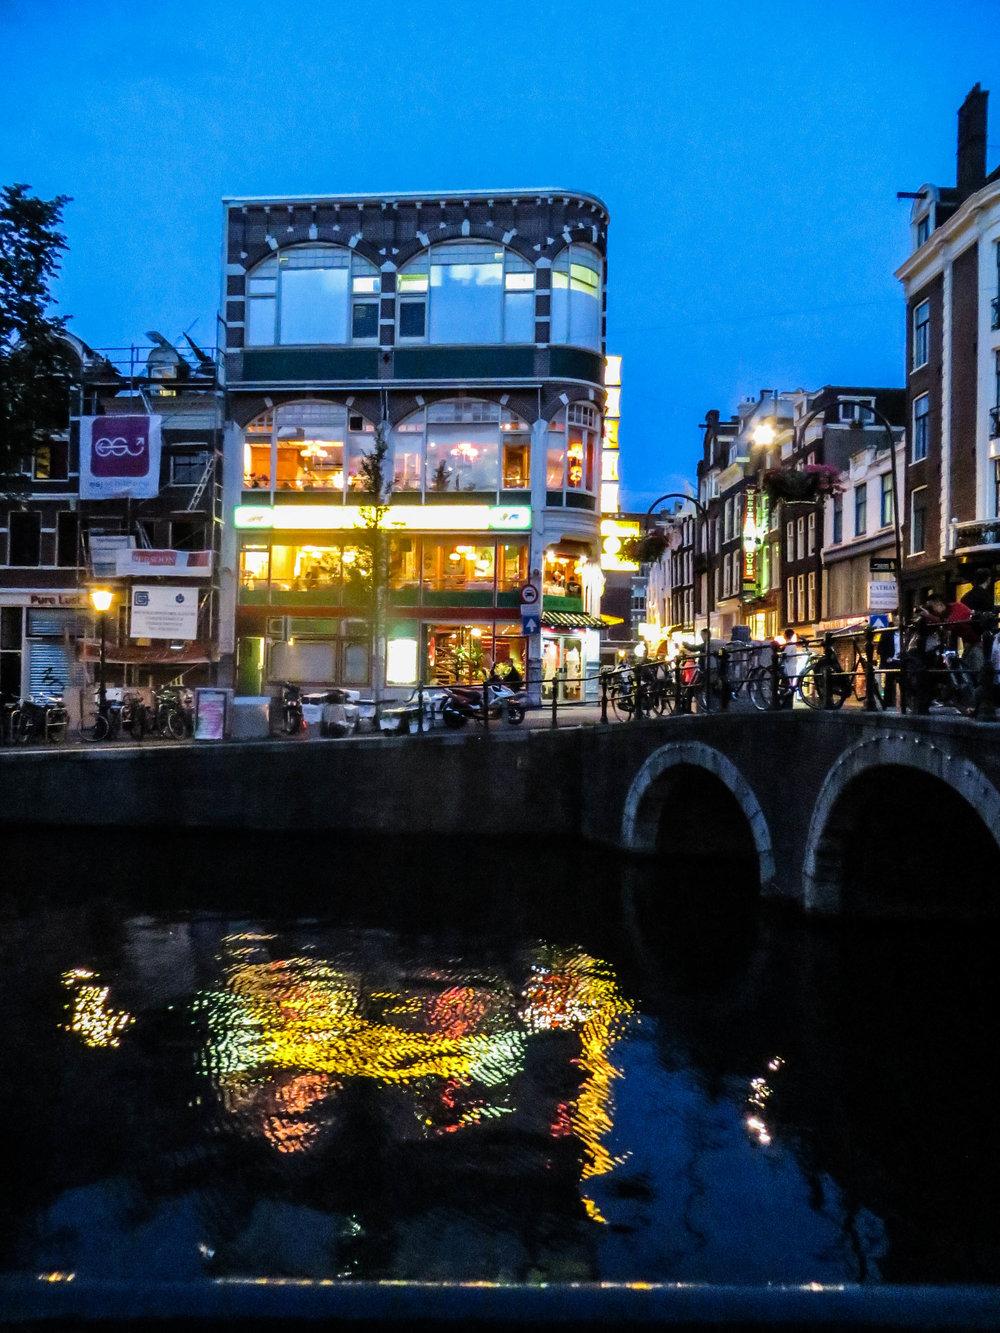 amsterdam-netherlands-street-photography-44.jpg